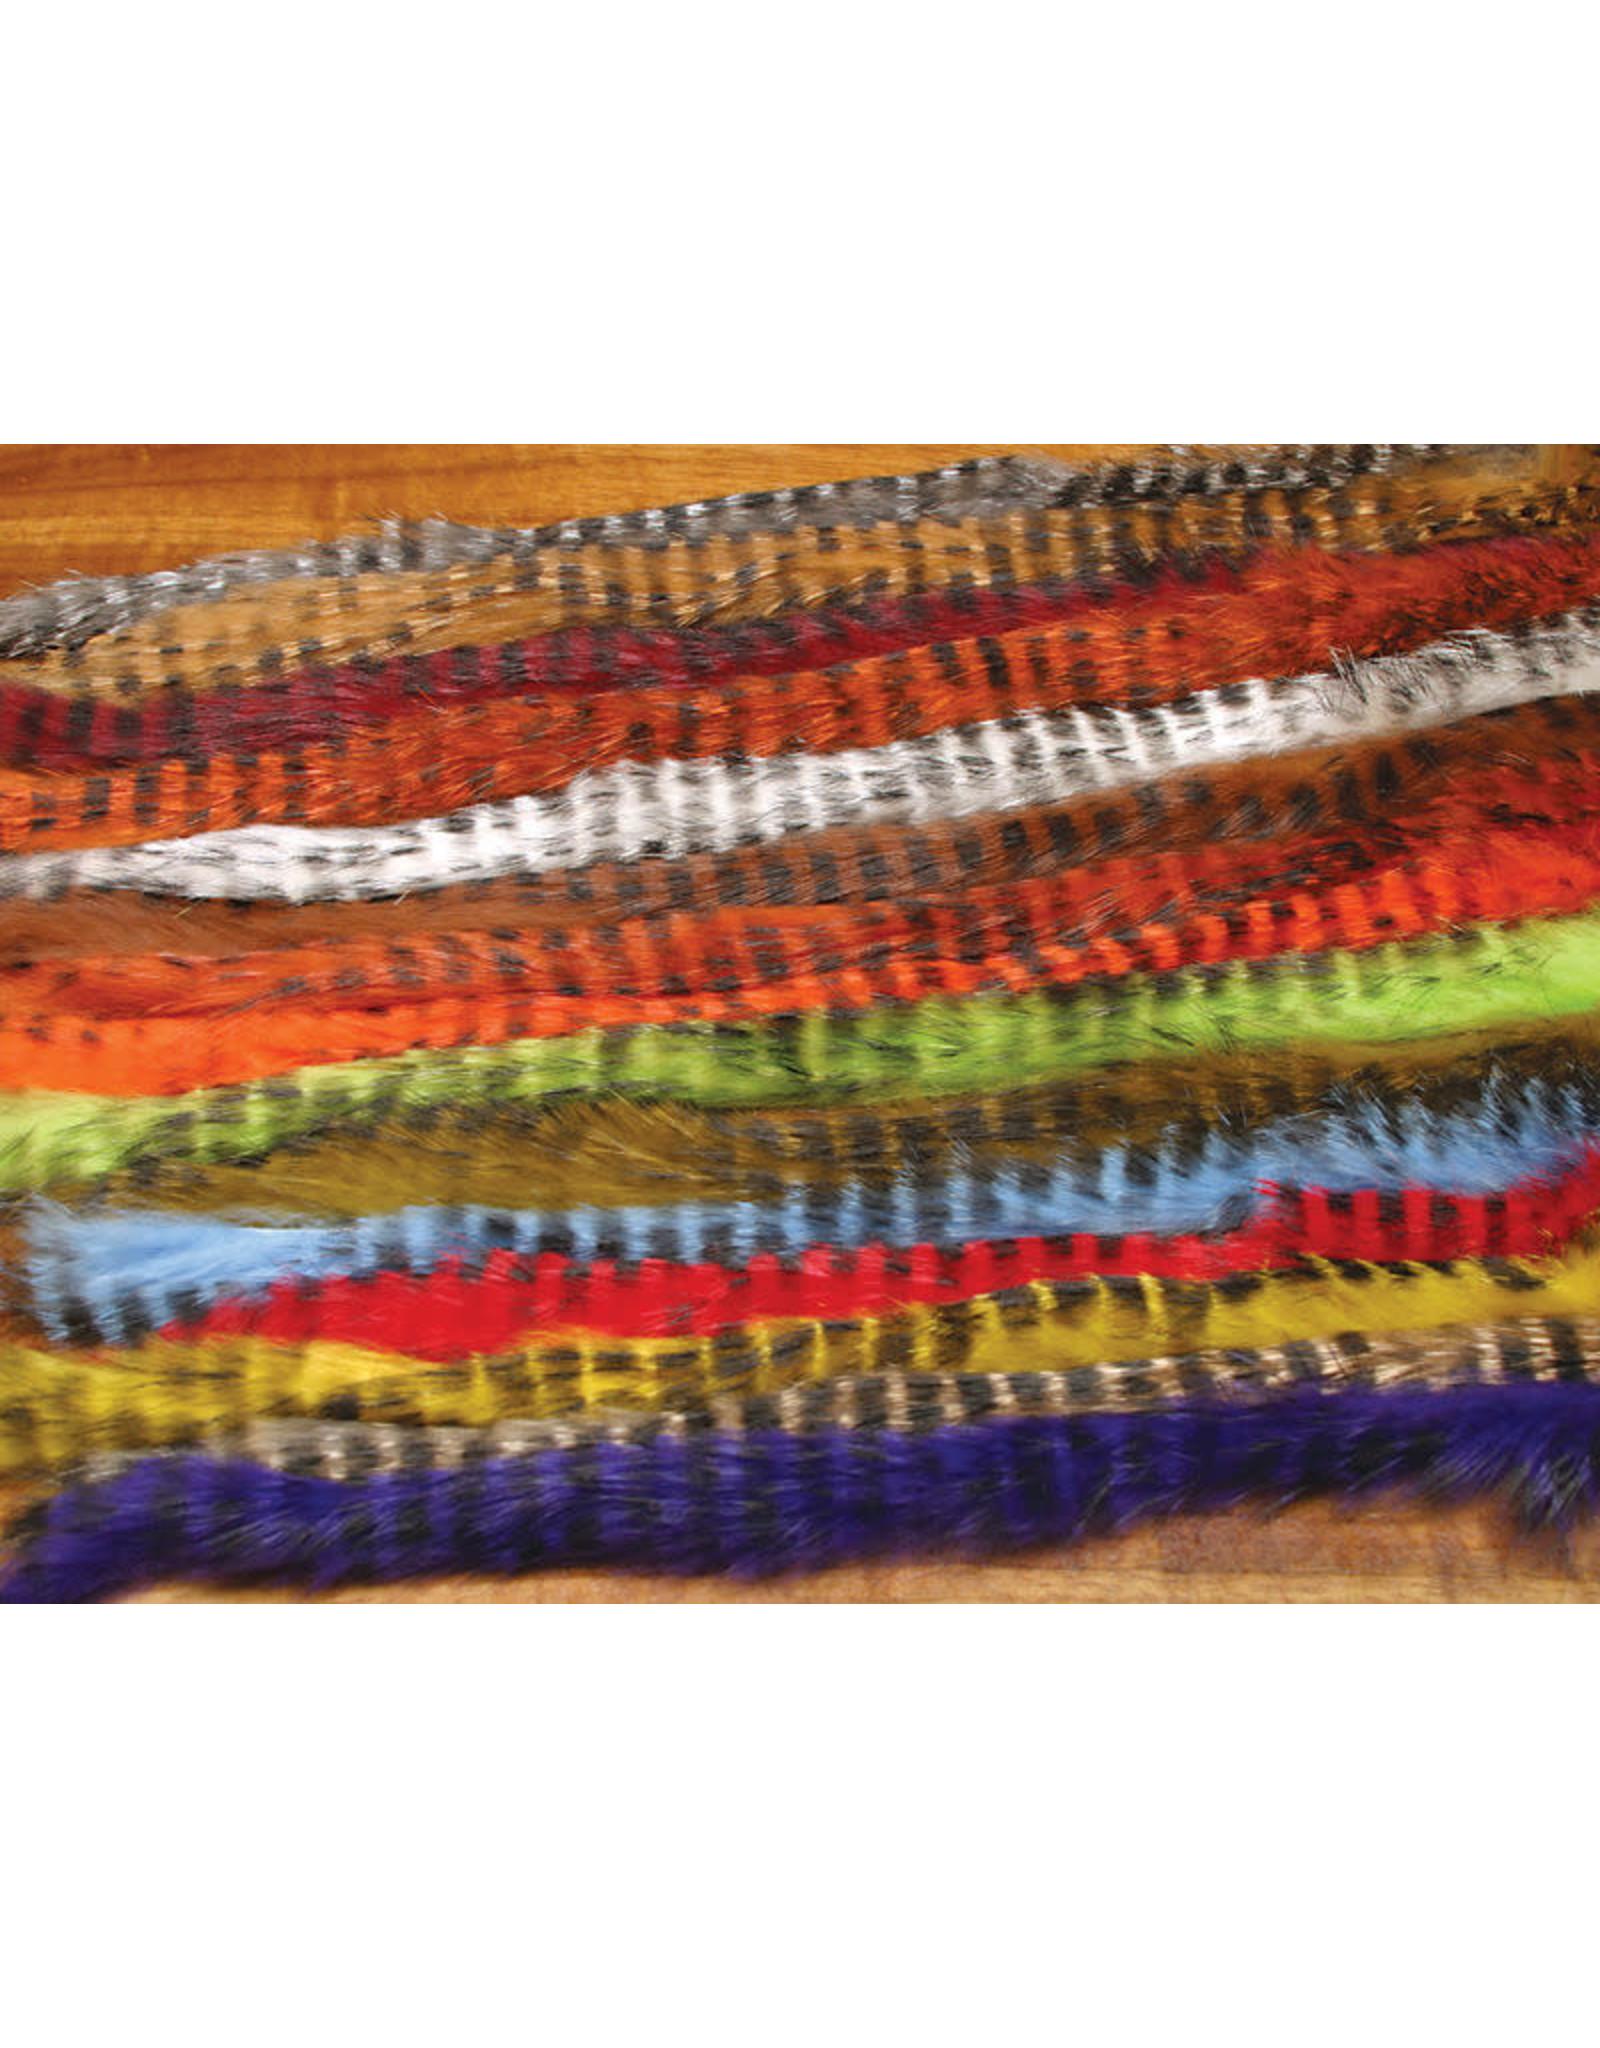 Hareline Dubbin Hareline Black Barred Rabbit Strips